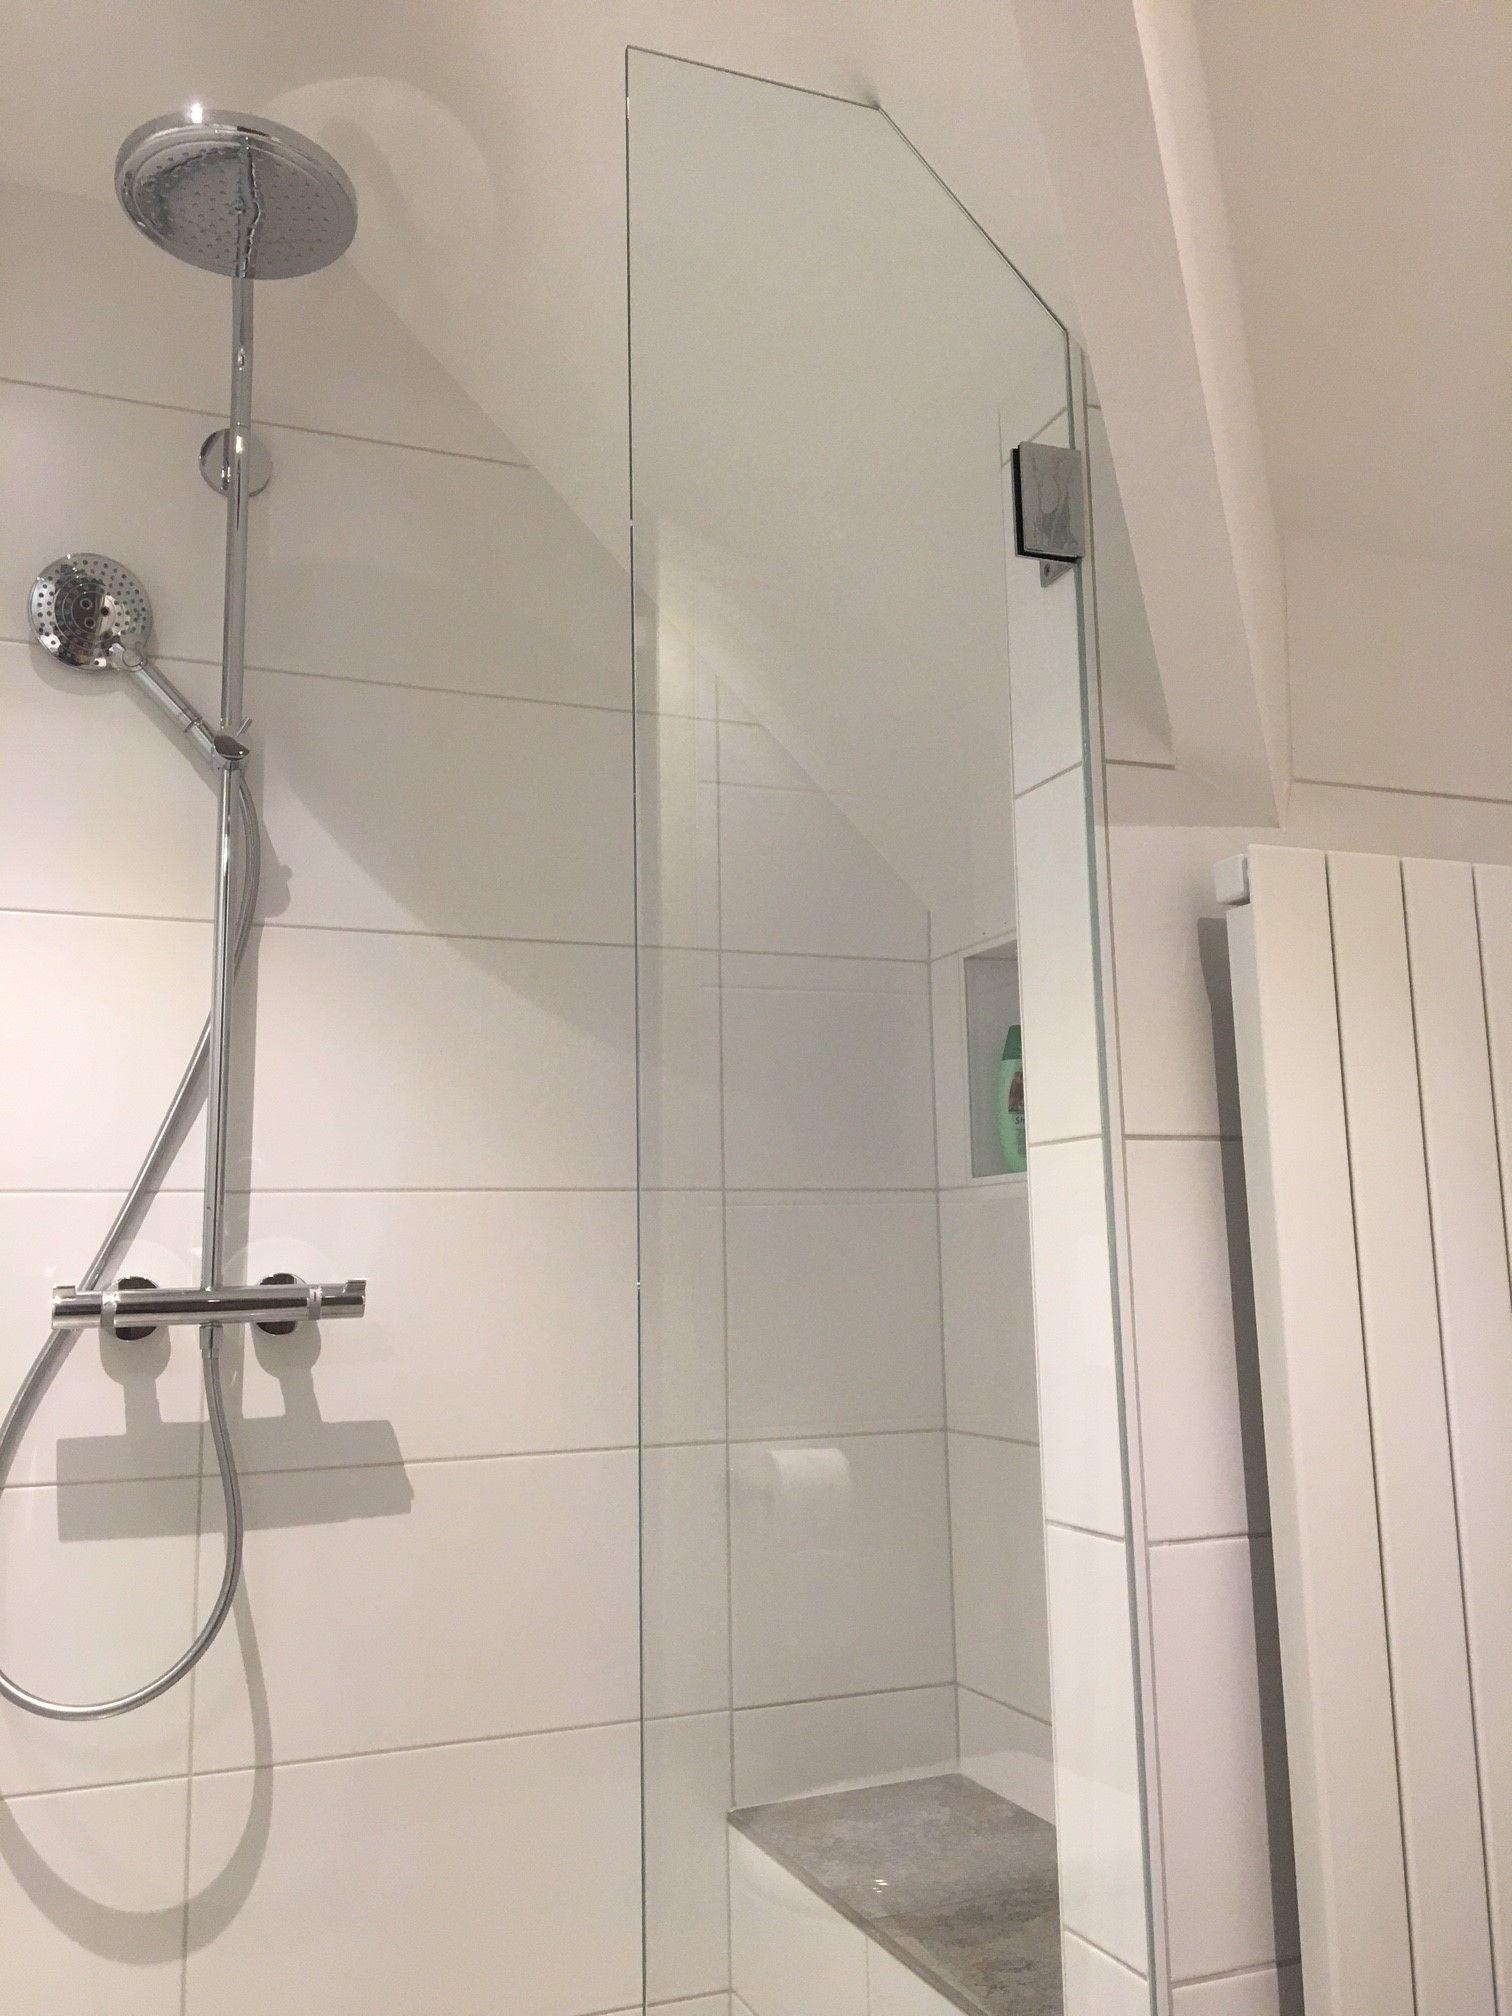 Maatwerk Douchewand Onder Schuin Dak I Balance Bathroom Dak